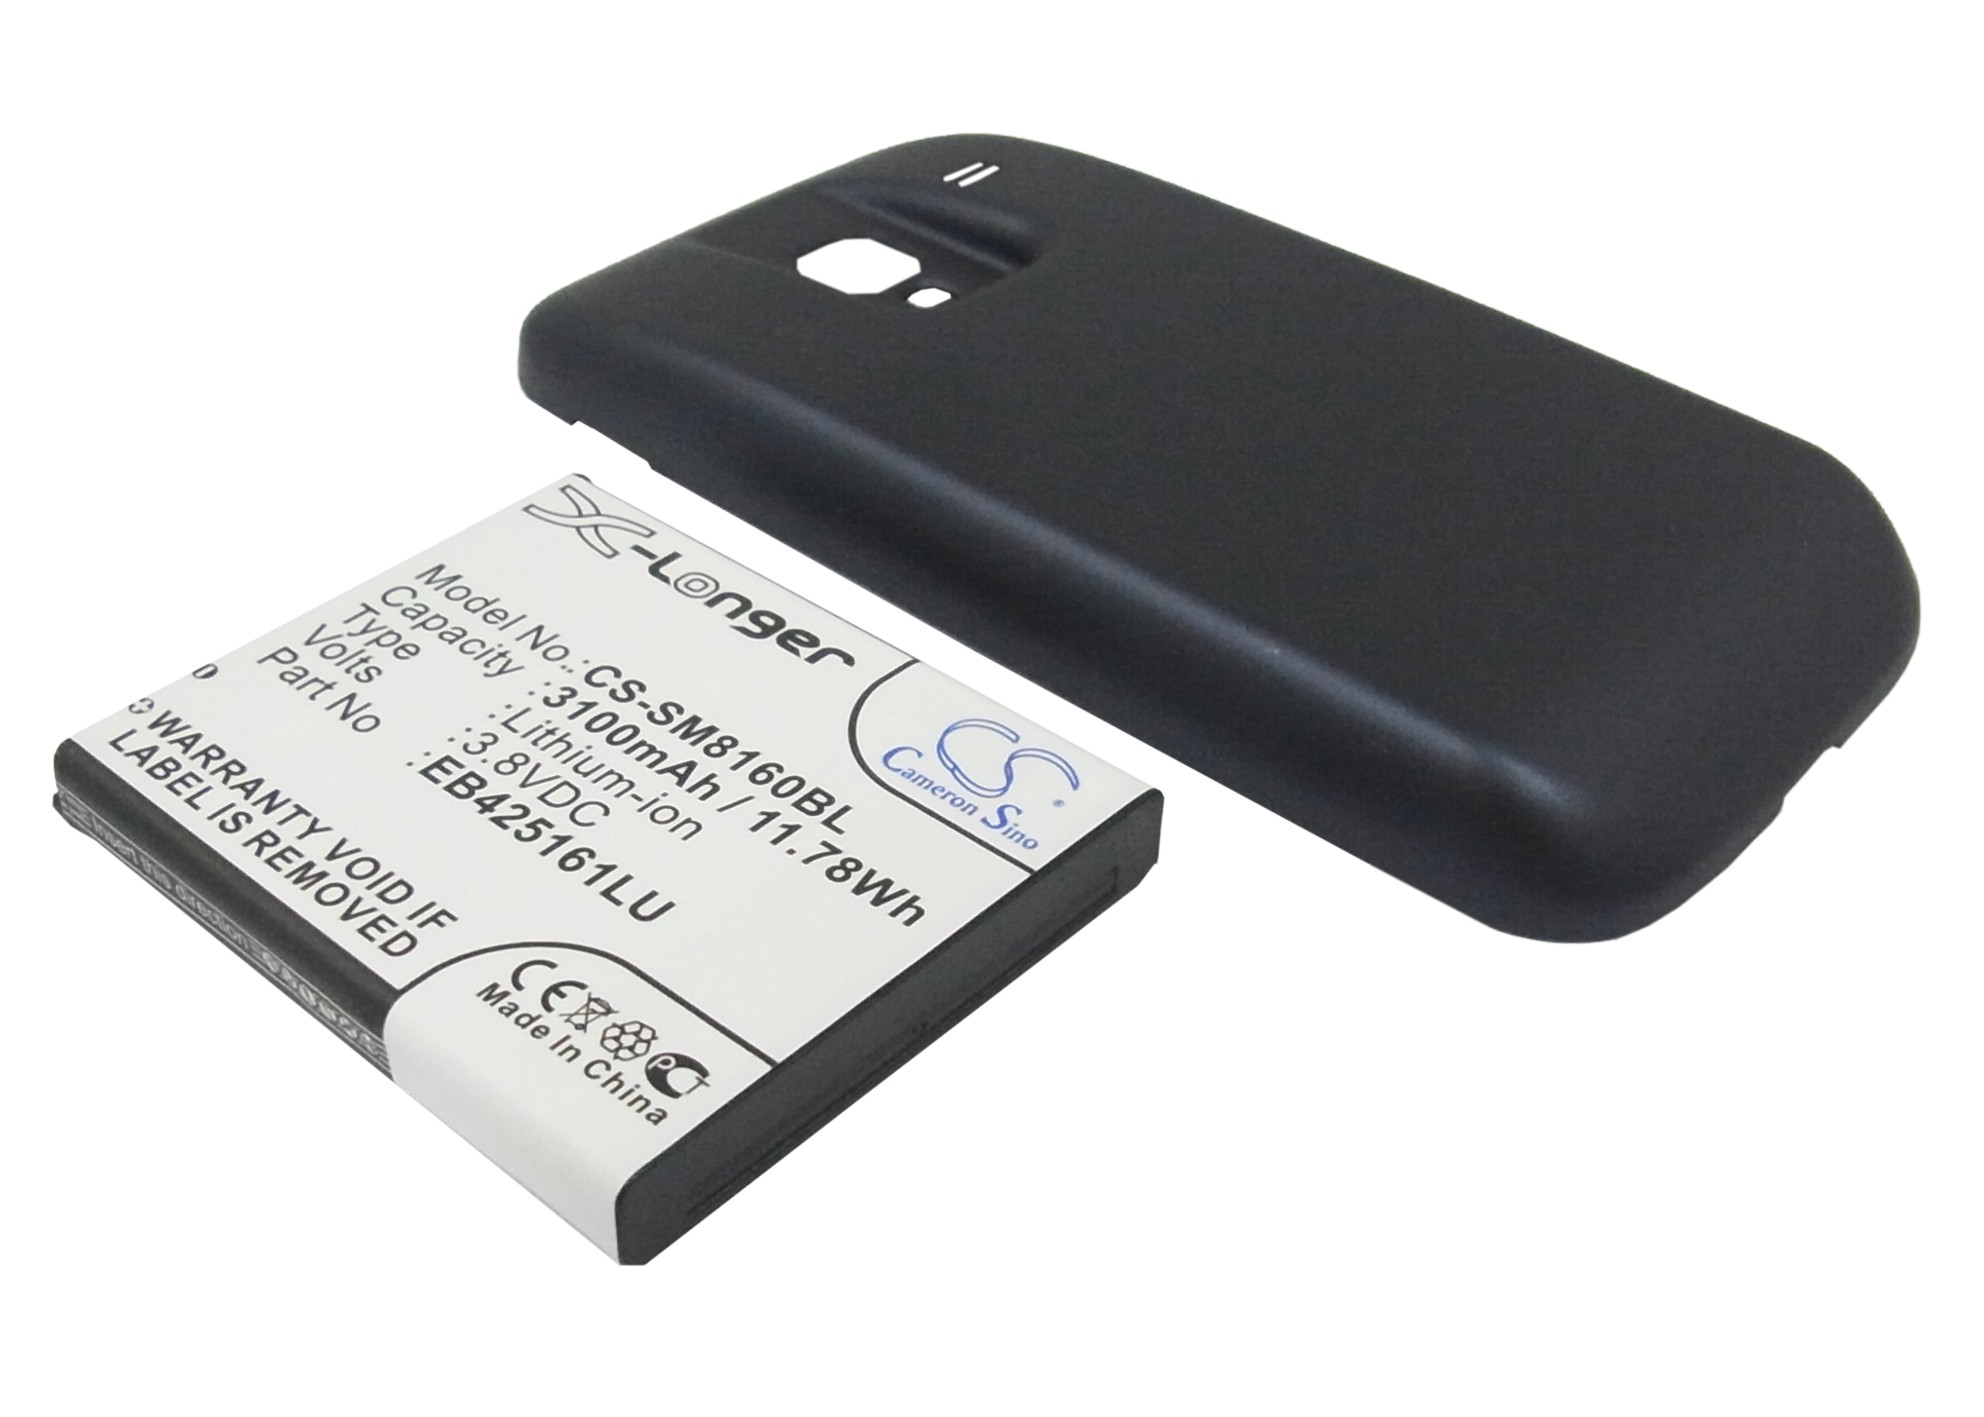 Cameron Sino baterie do mobilů pro SAMSUNG GT-I8160 3.8V Li-ion 3500mAh modrá - neoriginální